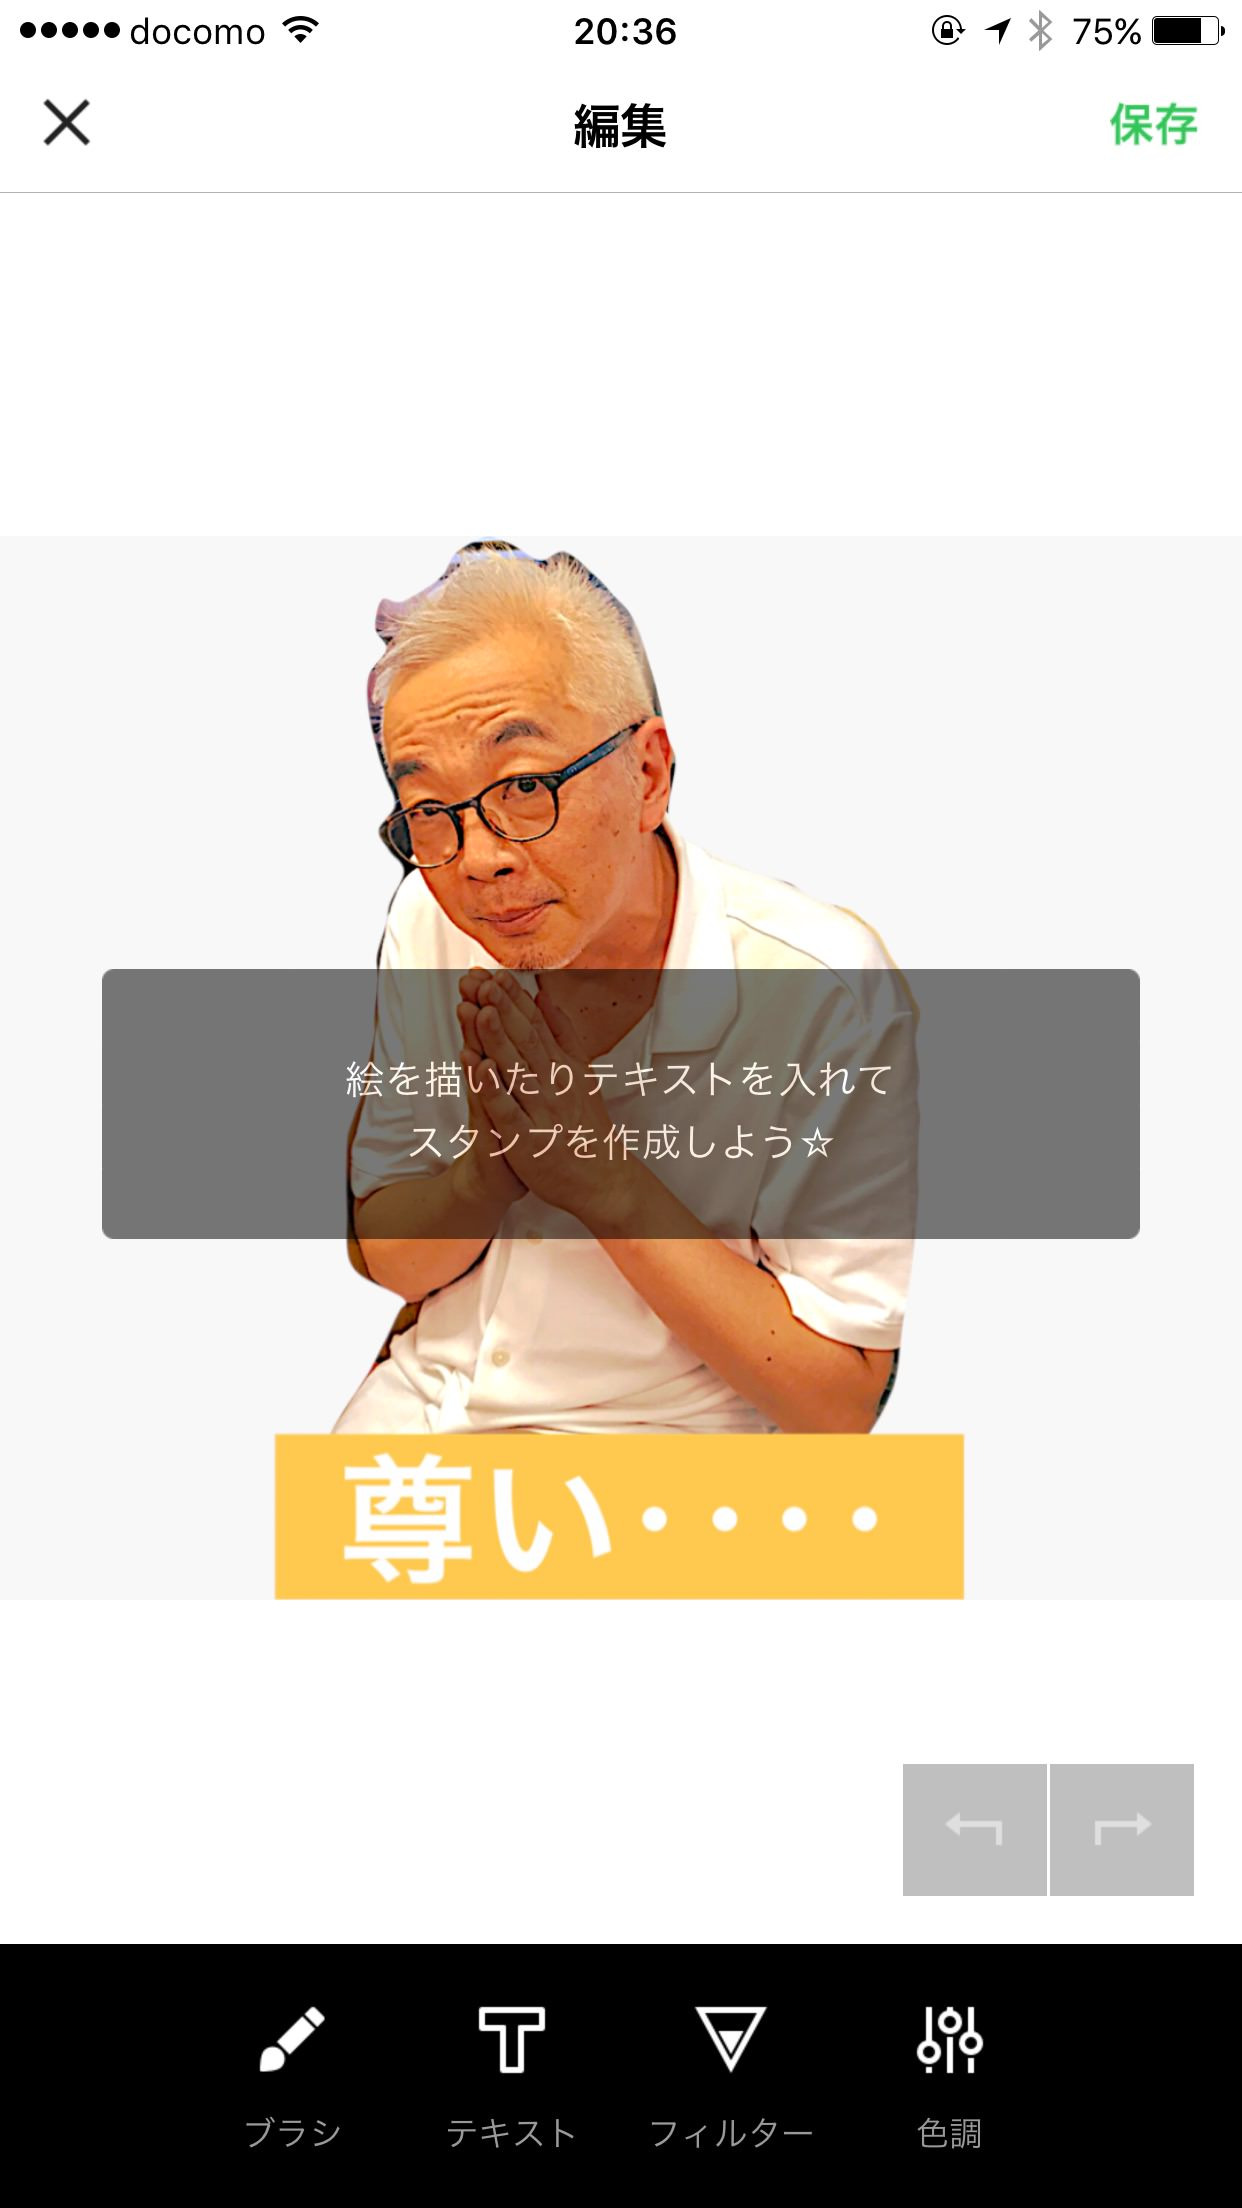 Line creators stamp 5333